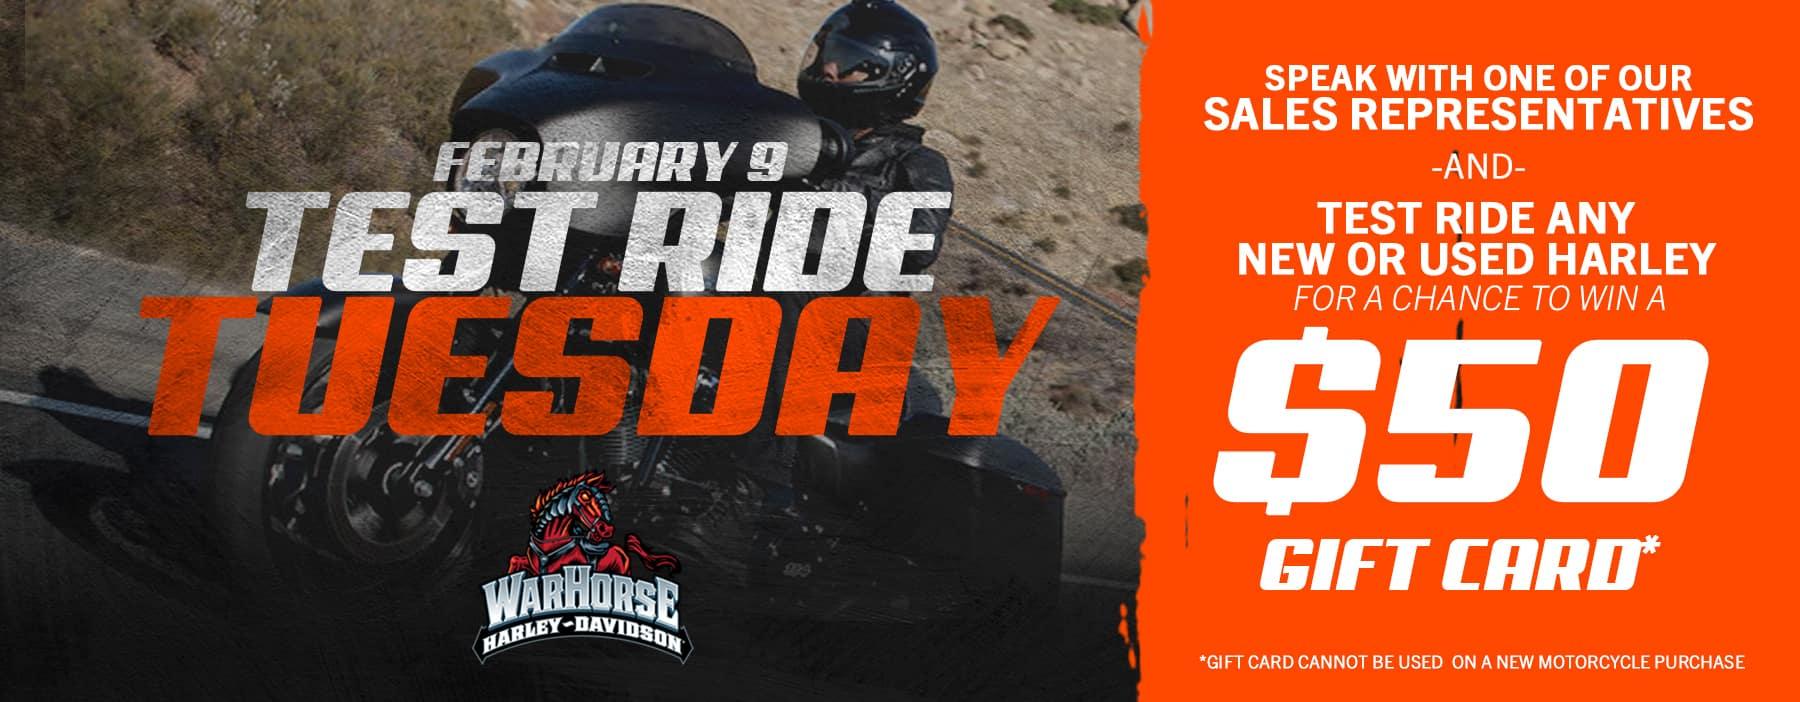 Test_Ride_TuesdayArtboard 3